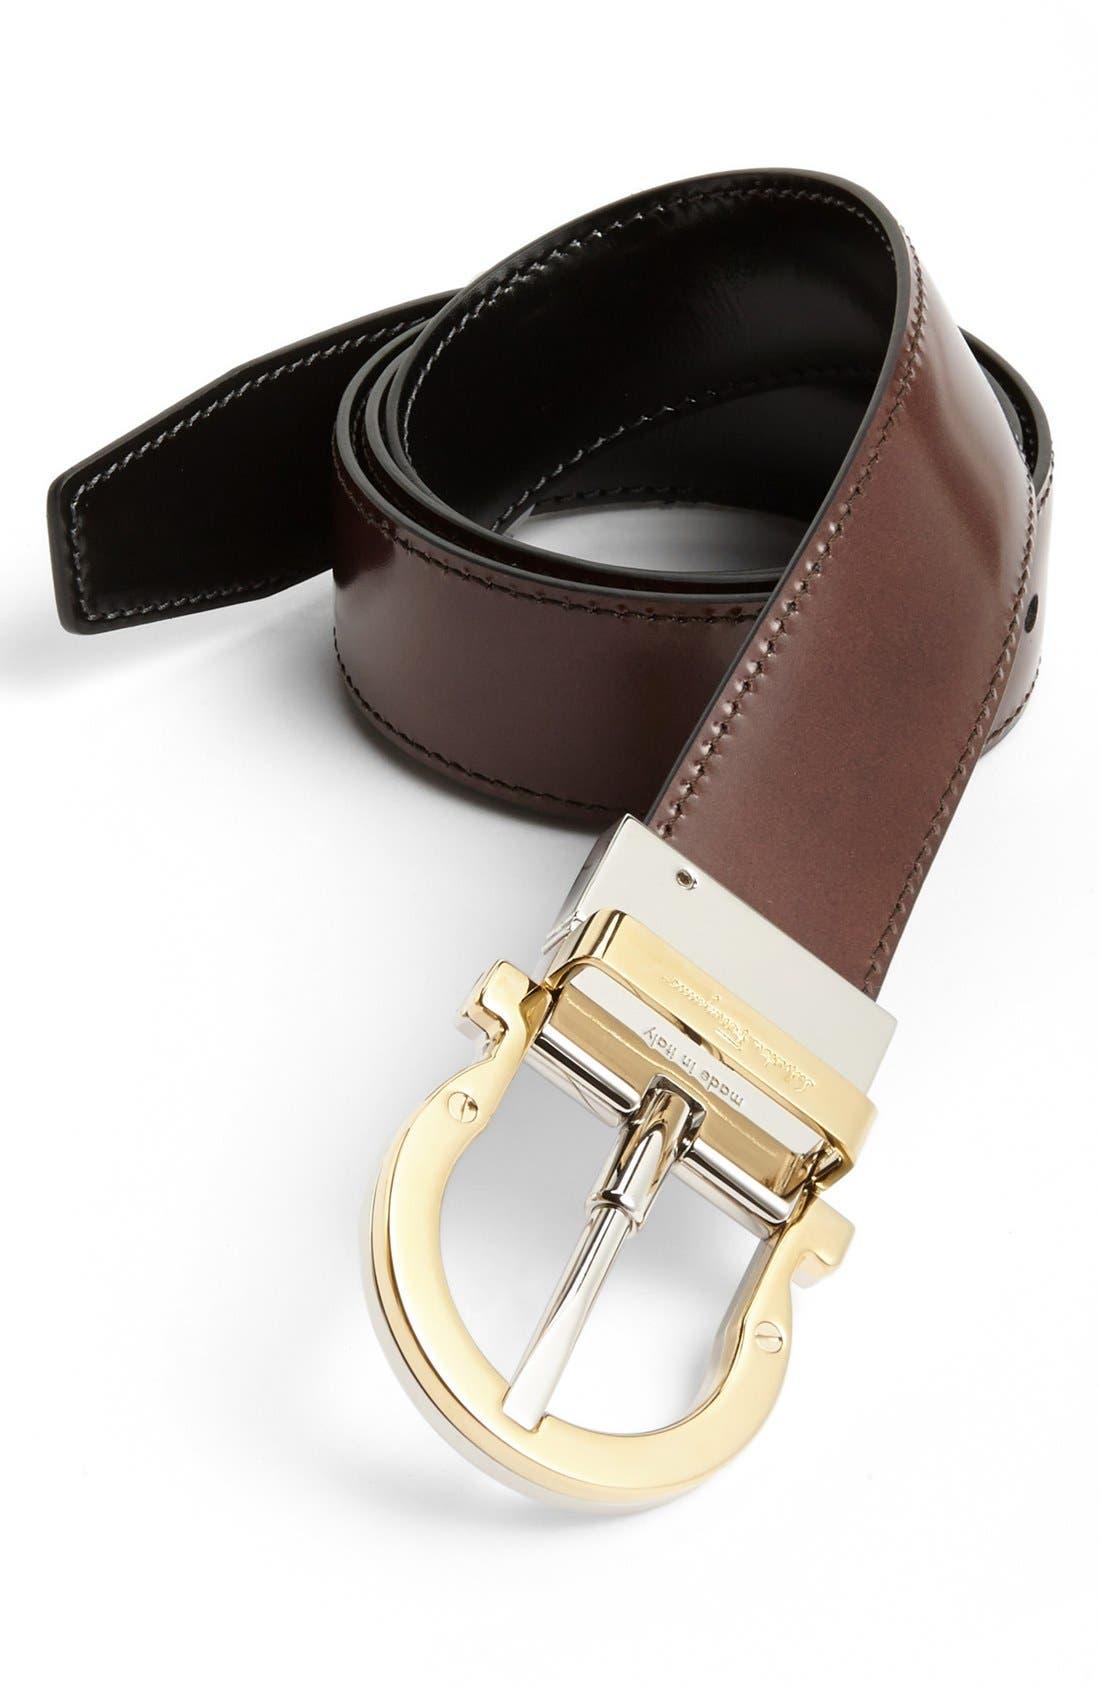 Main Image - Salvatore Ferragamo 'Twirl' Reversible Belt